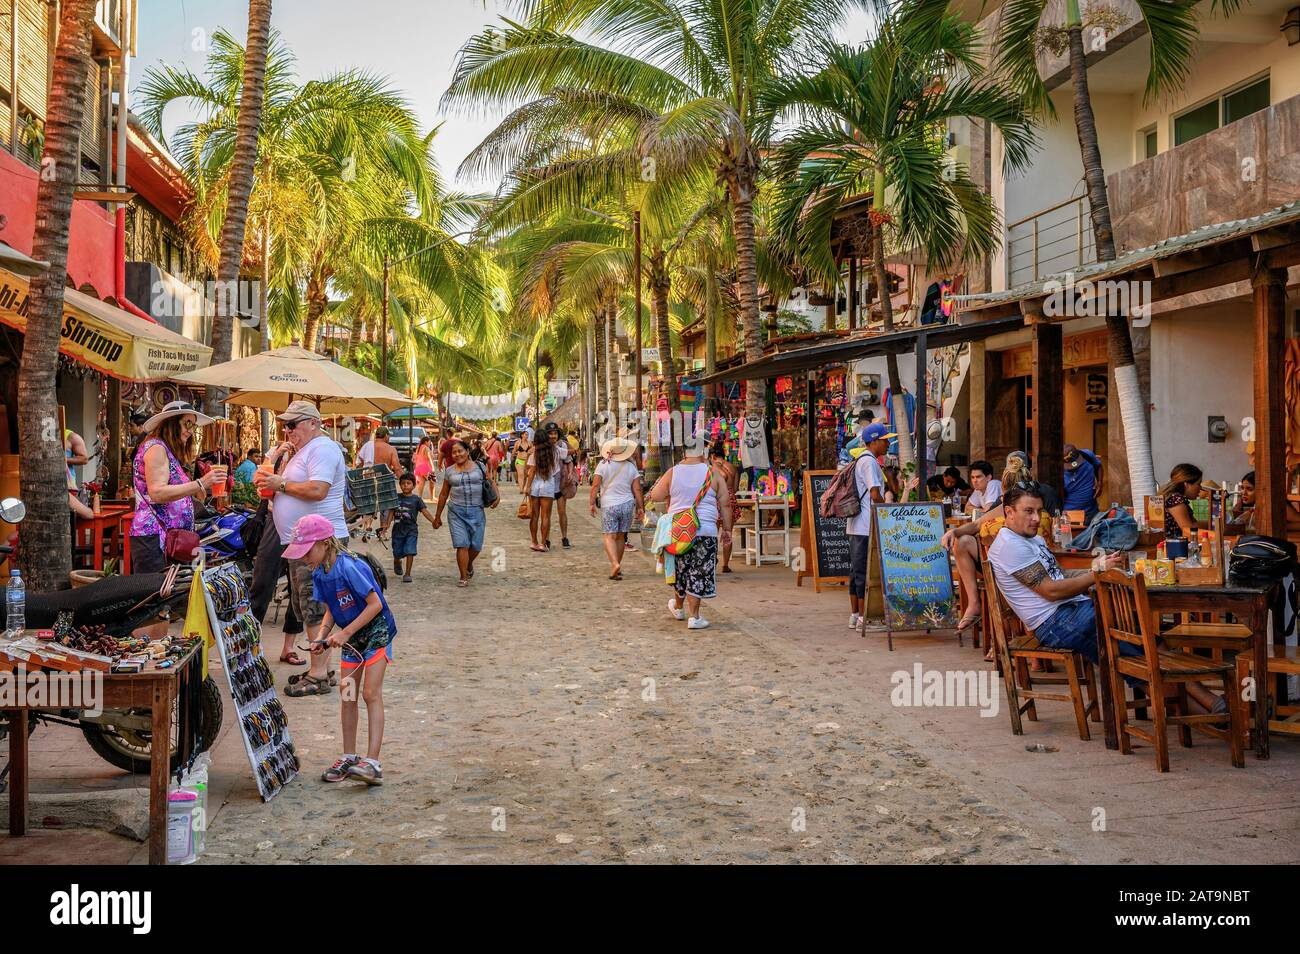 Restaurants and shops in Sayulita, Riviera Nayarit, Mexico. Stock Photo